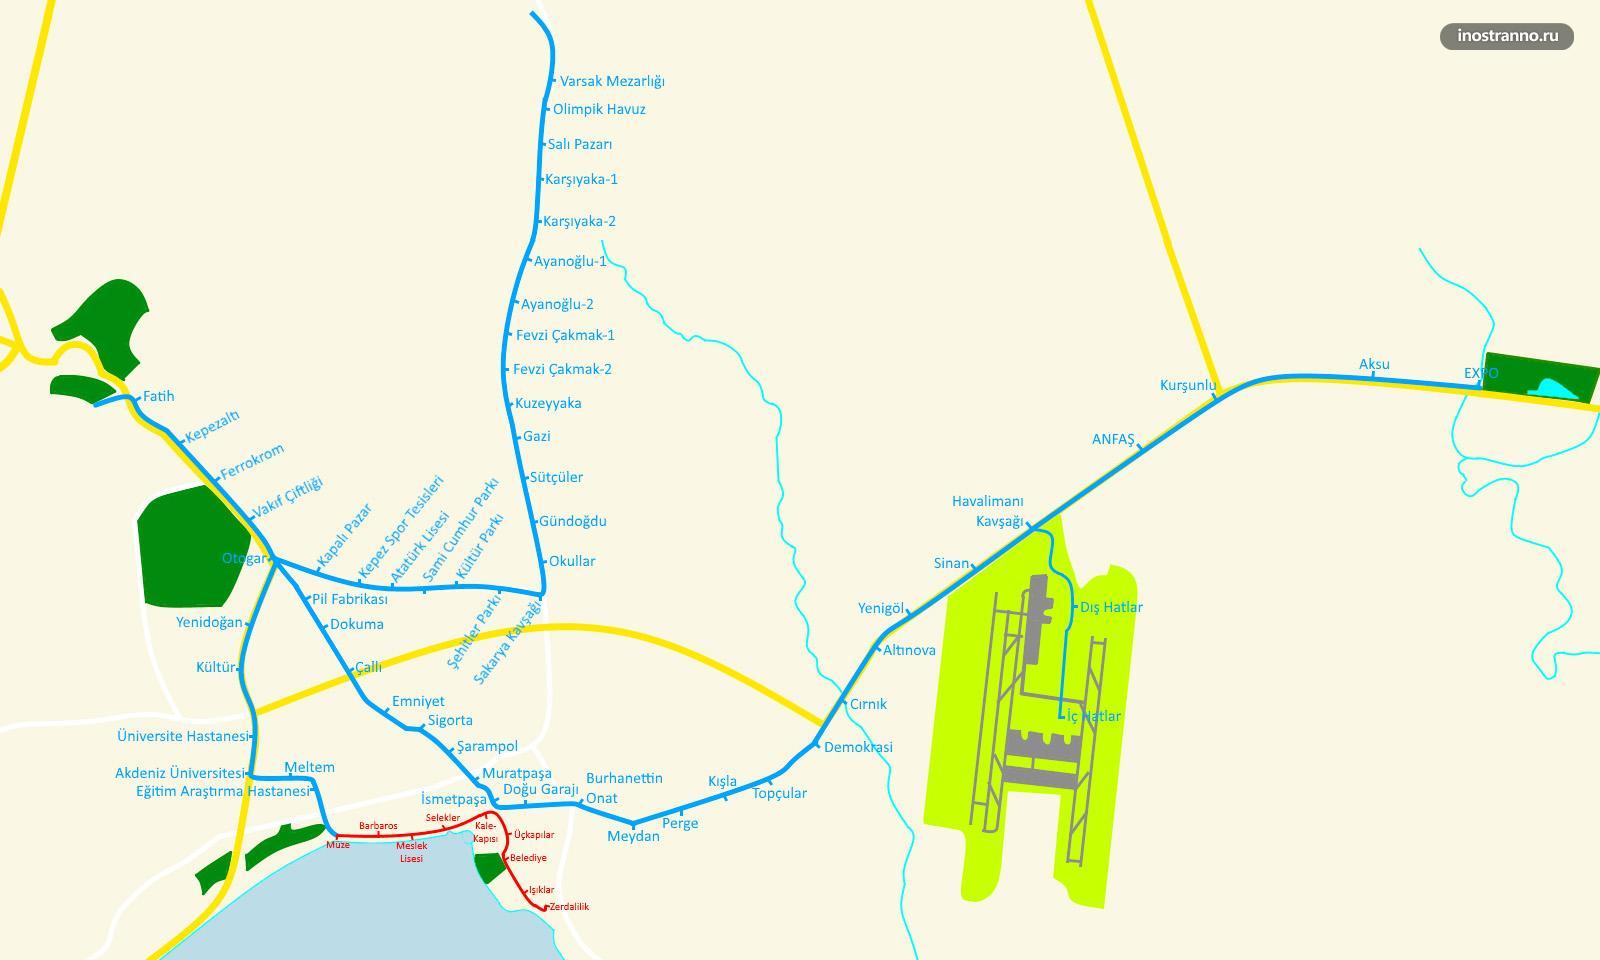 Карта схема метро Анталии